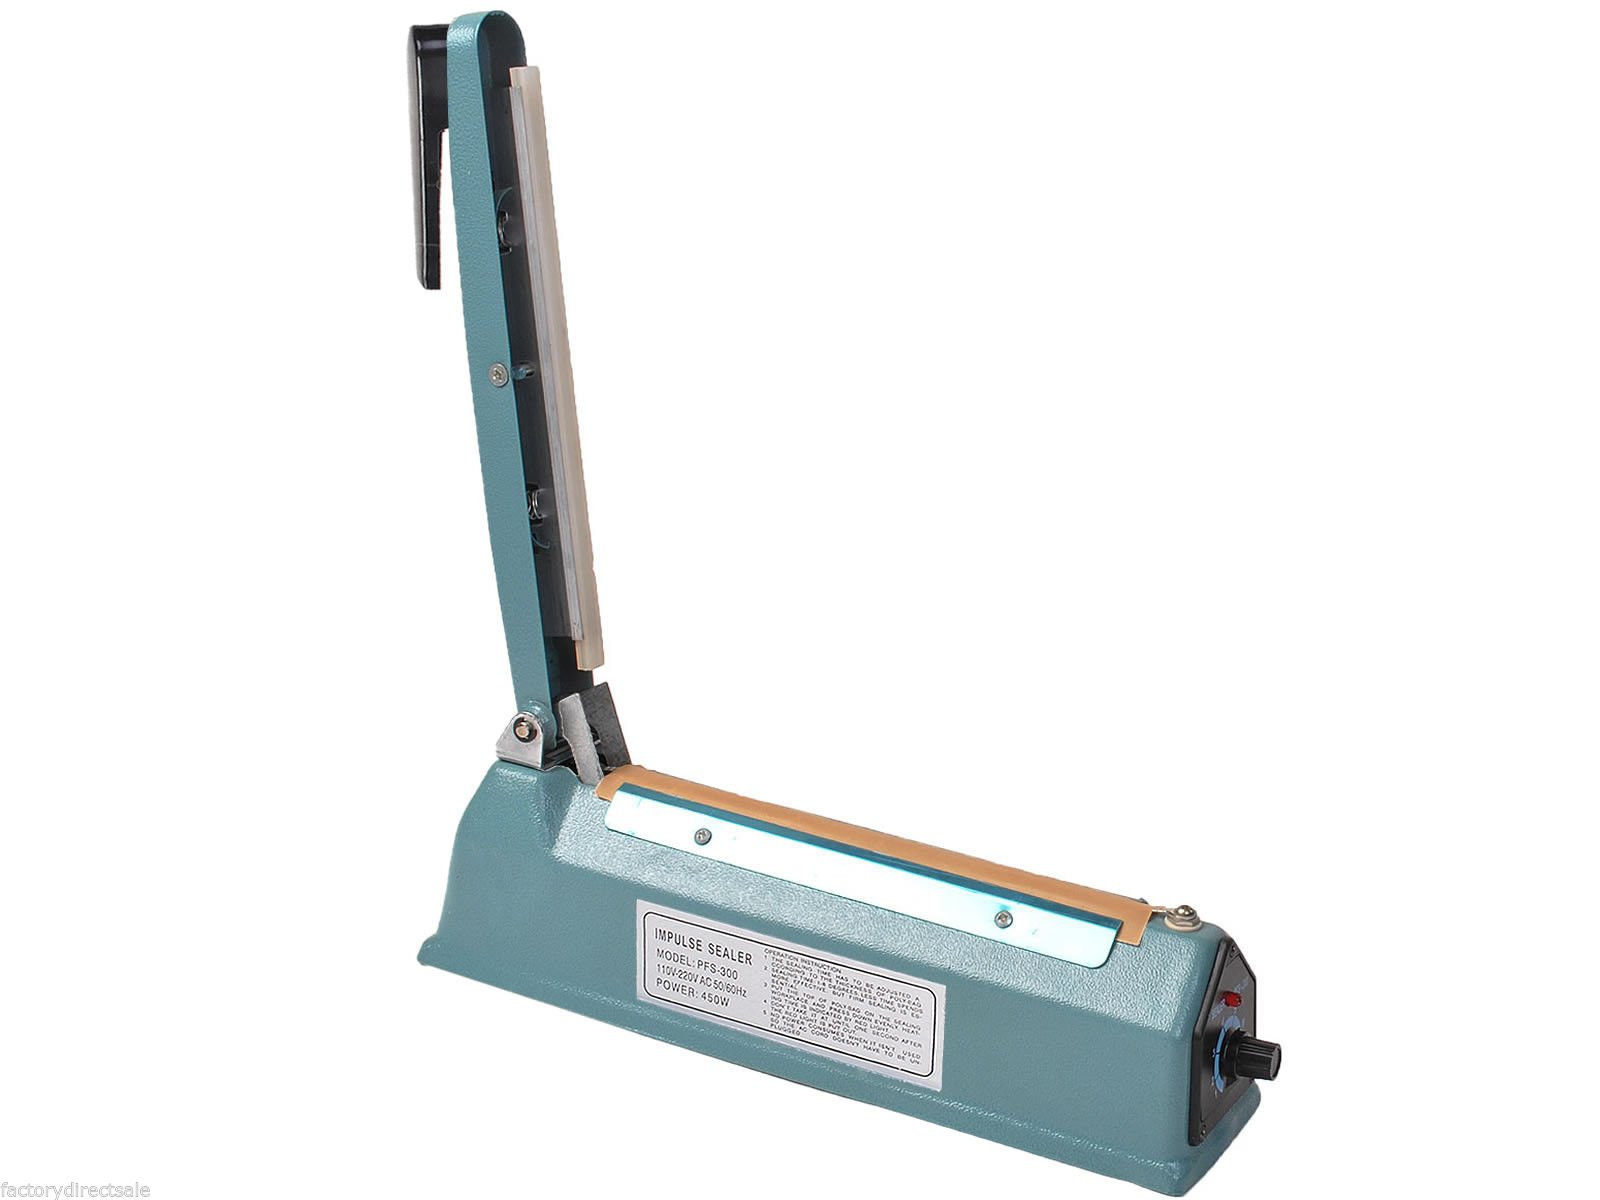 Super buy 12'' Heat Sealing Hand Impulse Sealer Machine Poly Free Element Grip& Teflon by Goplus (Image #6)